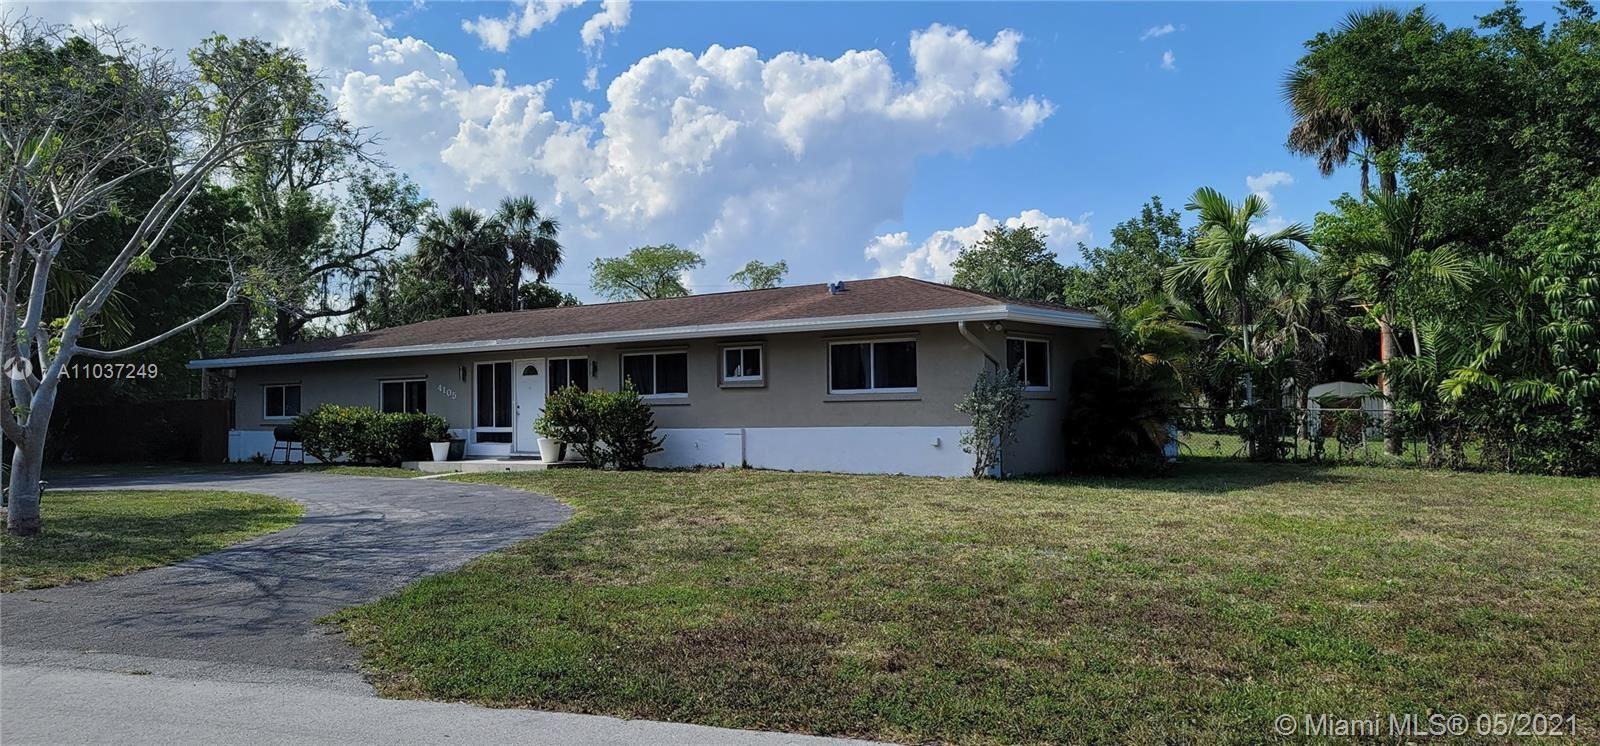 Photo of Plantation, FL 33317 (MLS # A11037249)